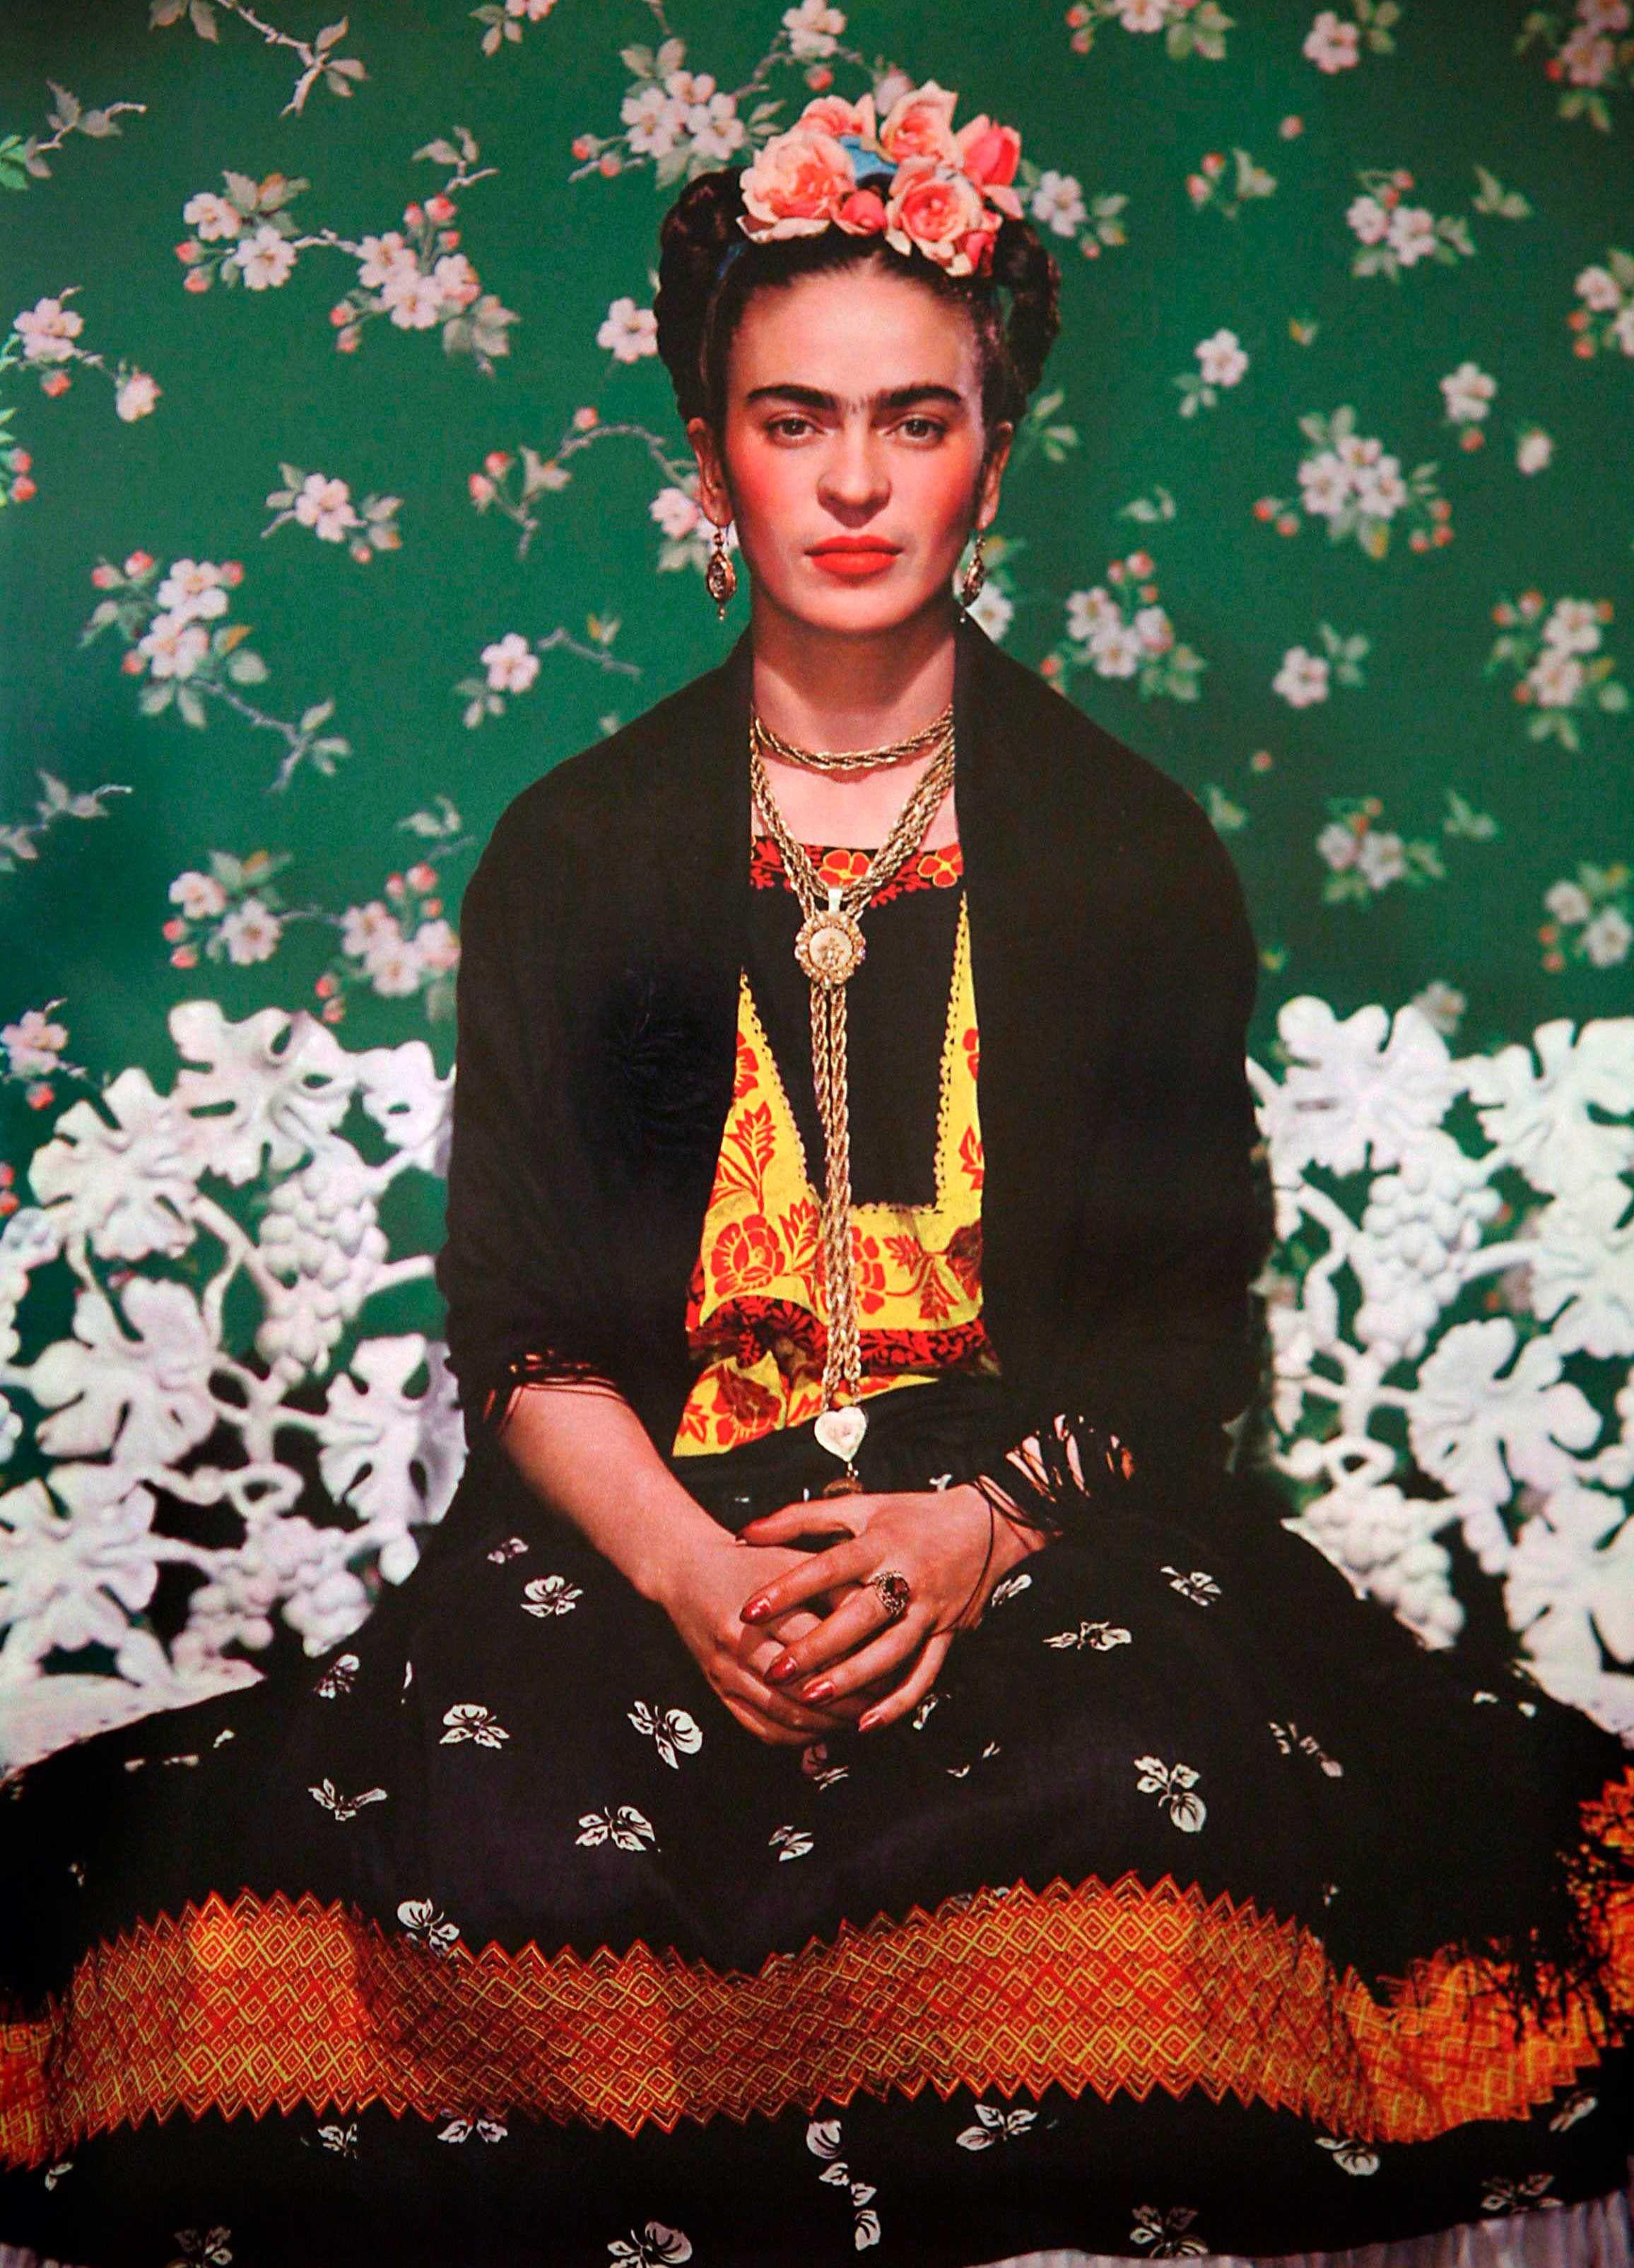 c4e24ff00 Beautiful Frida Kahlo quotes to inspire you today | Inspiring life quotes